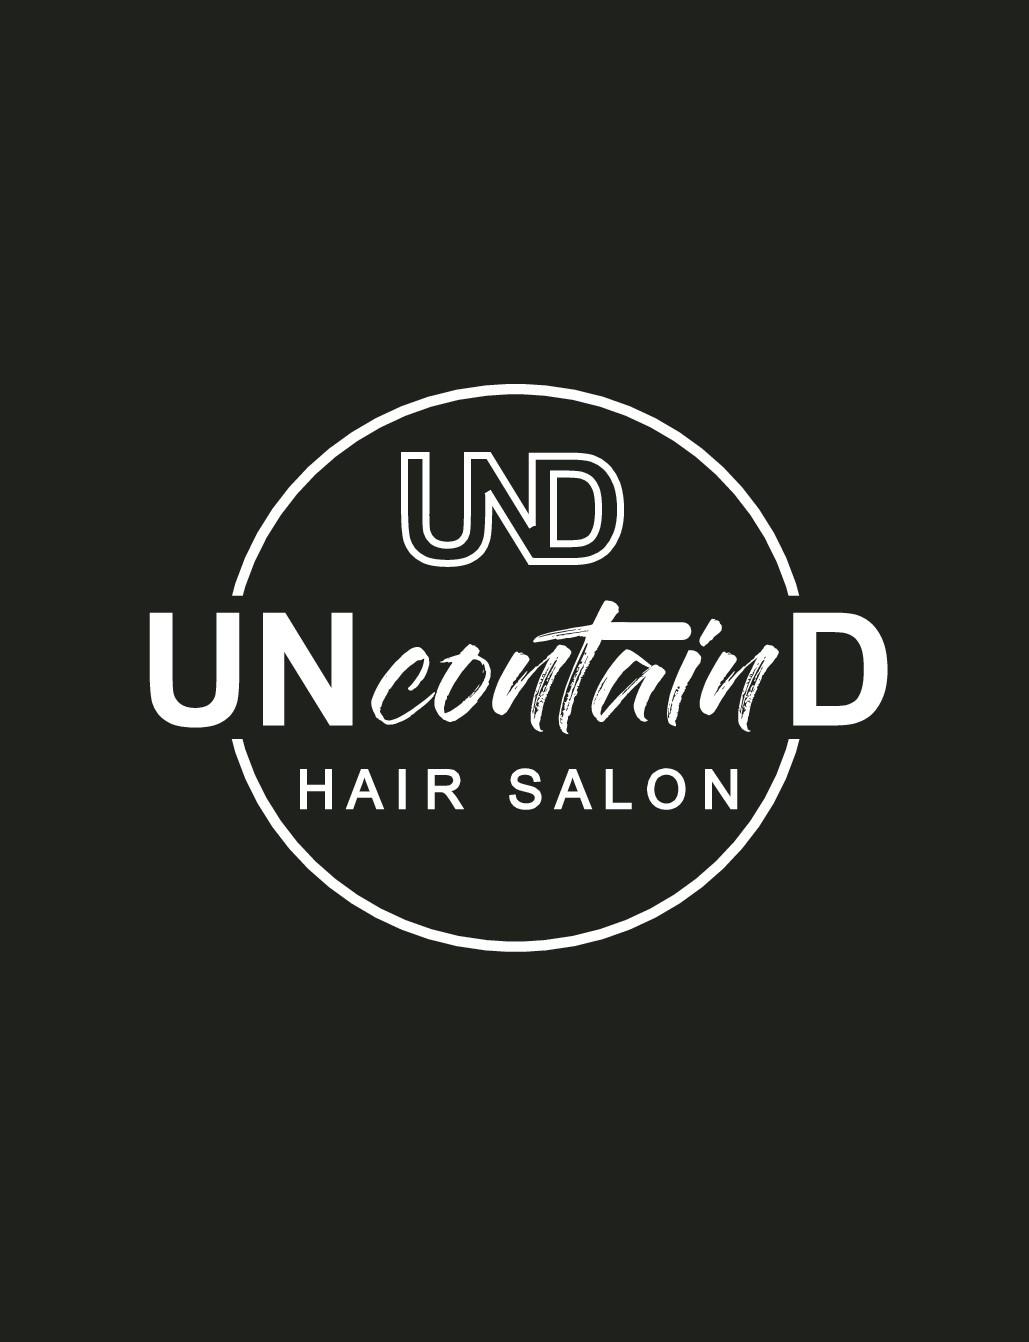 Think UNcontainD - Logo for Cutting Edge Hair Salon